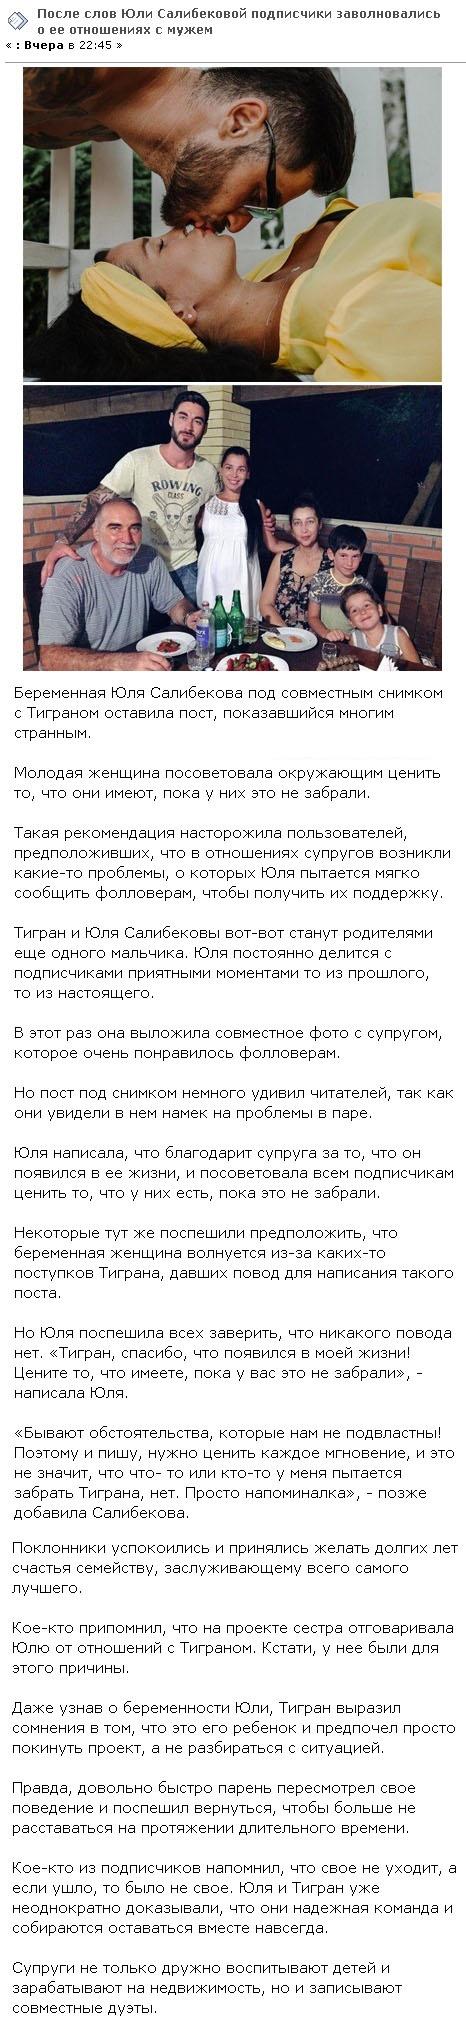 Слухи о размолвке в семье Тиграна Салибекова и Юлии Колисниченко